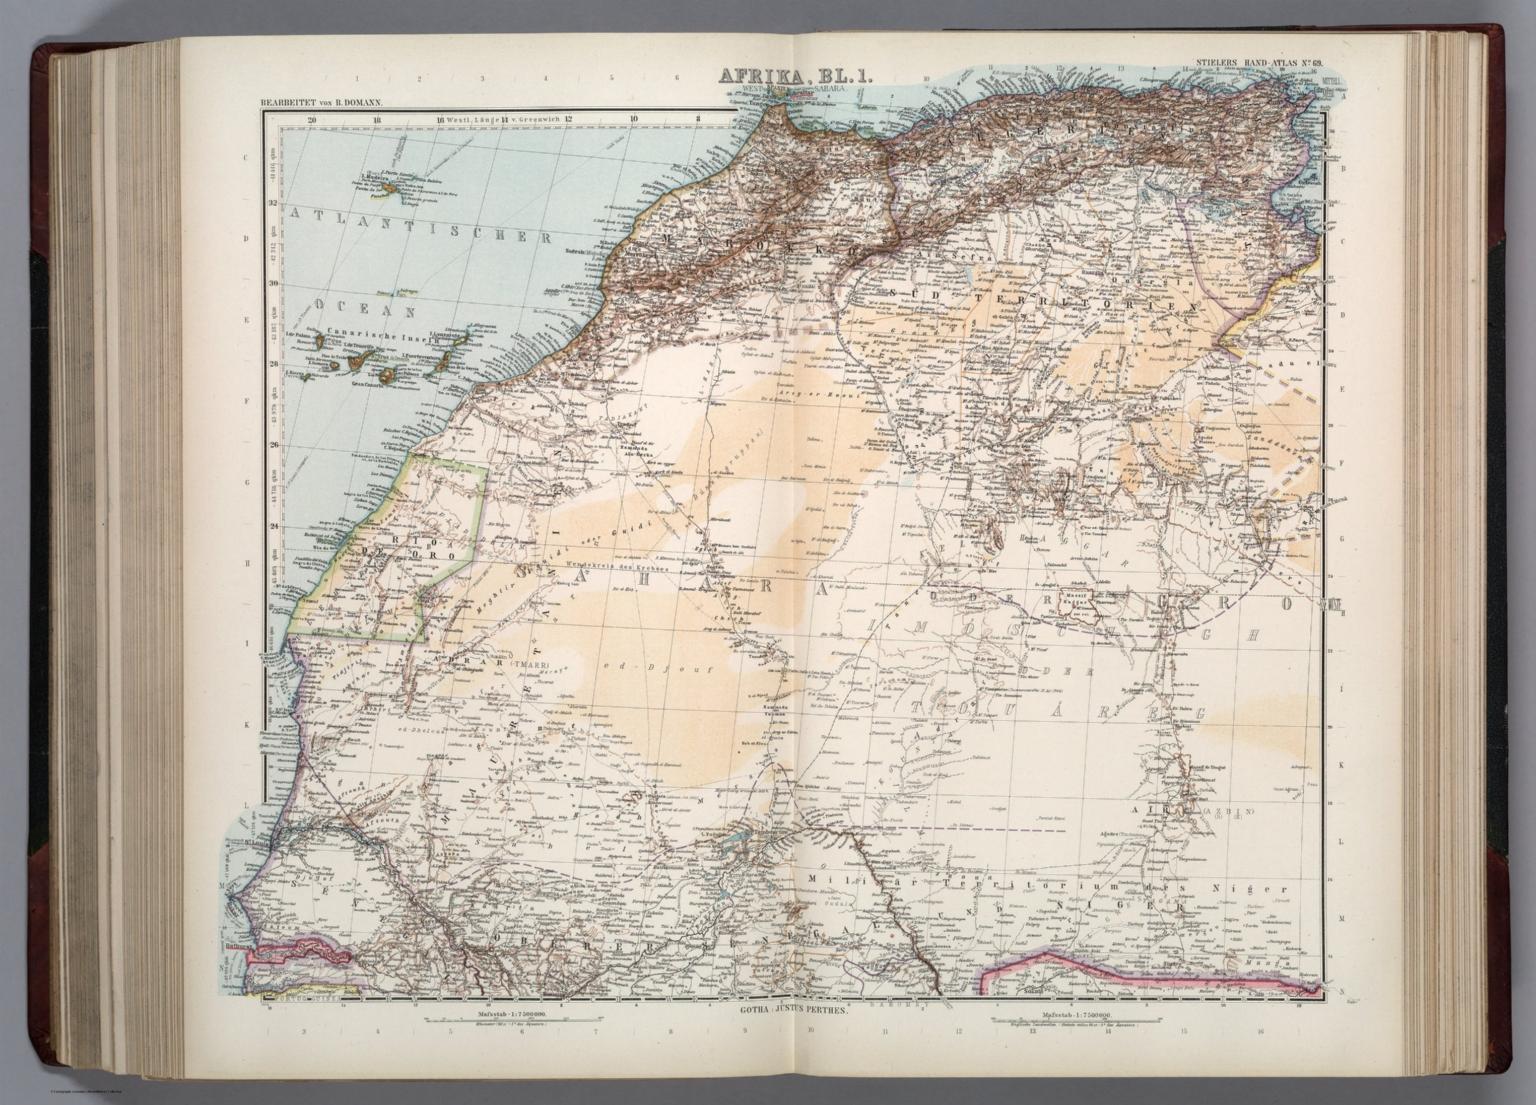 69. Afrika in 7 Blaettern, Bl. 1.